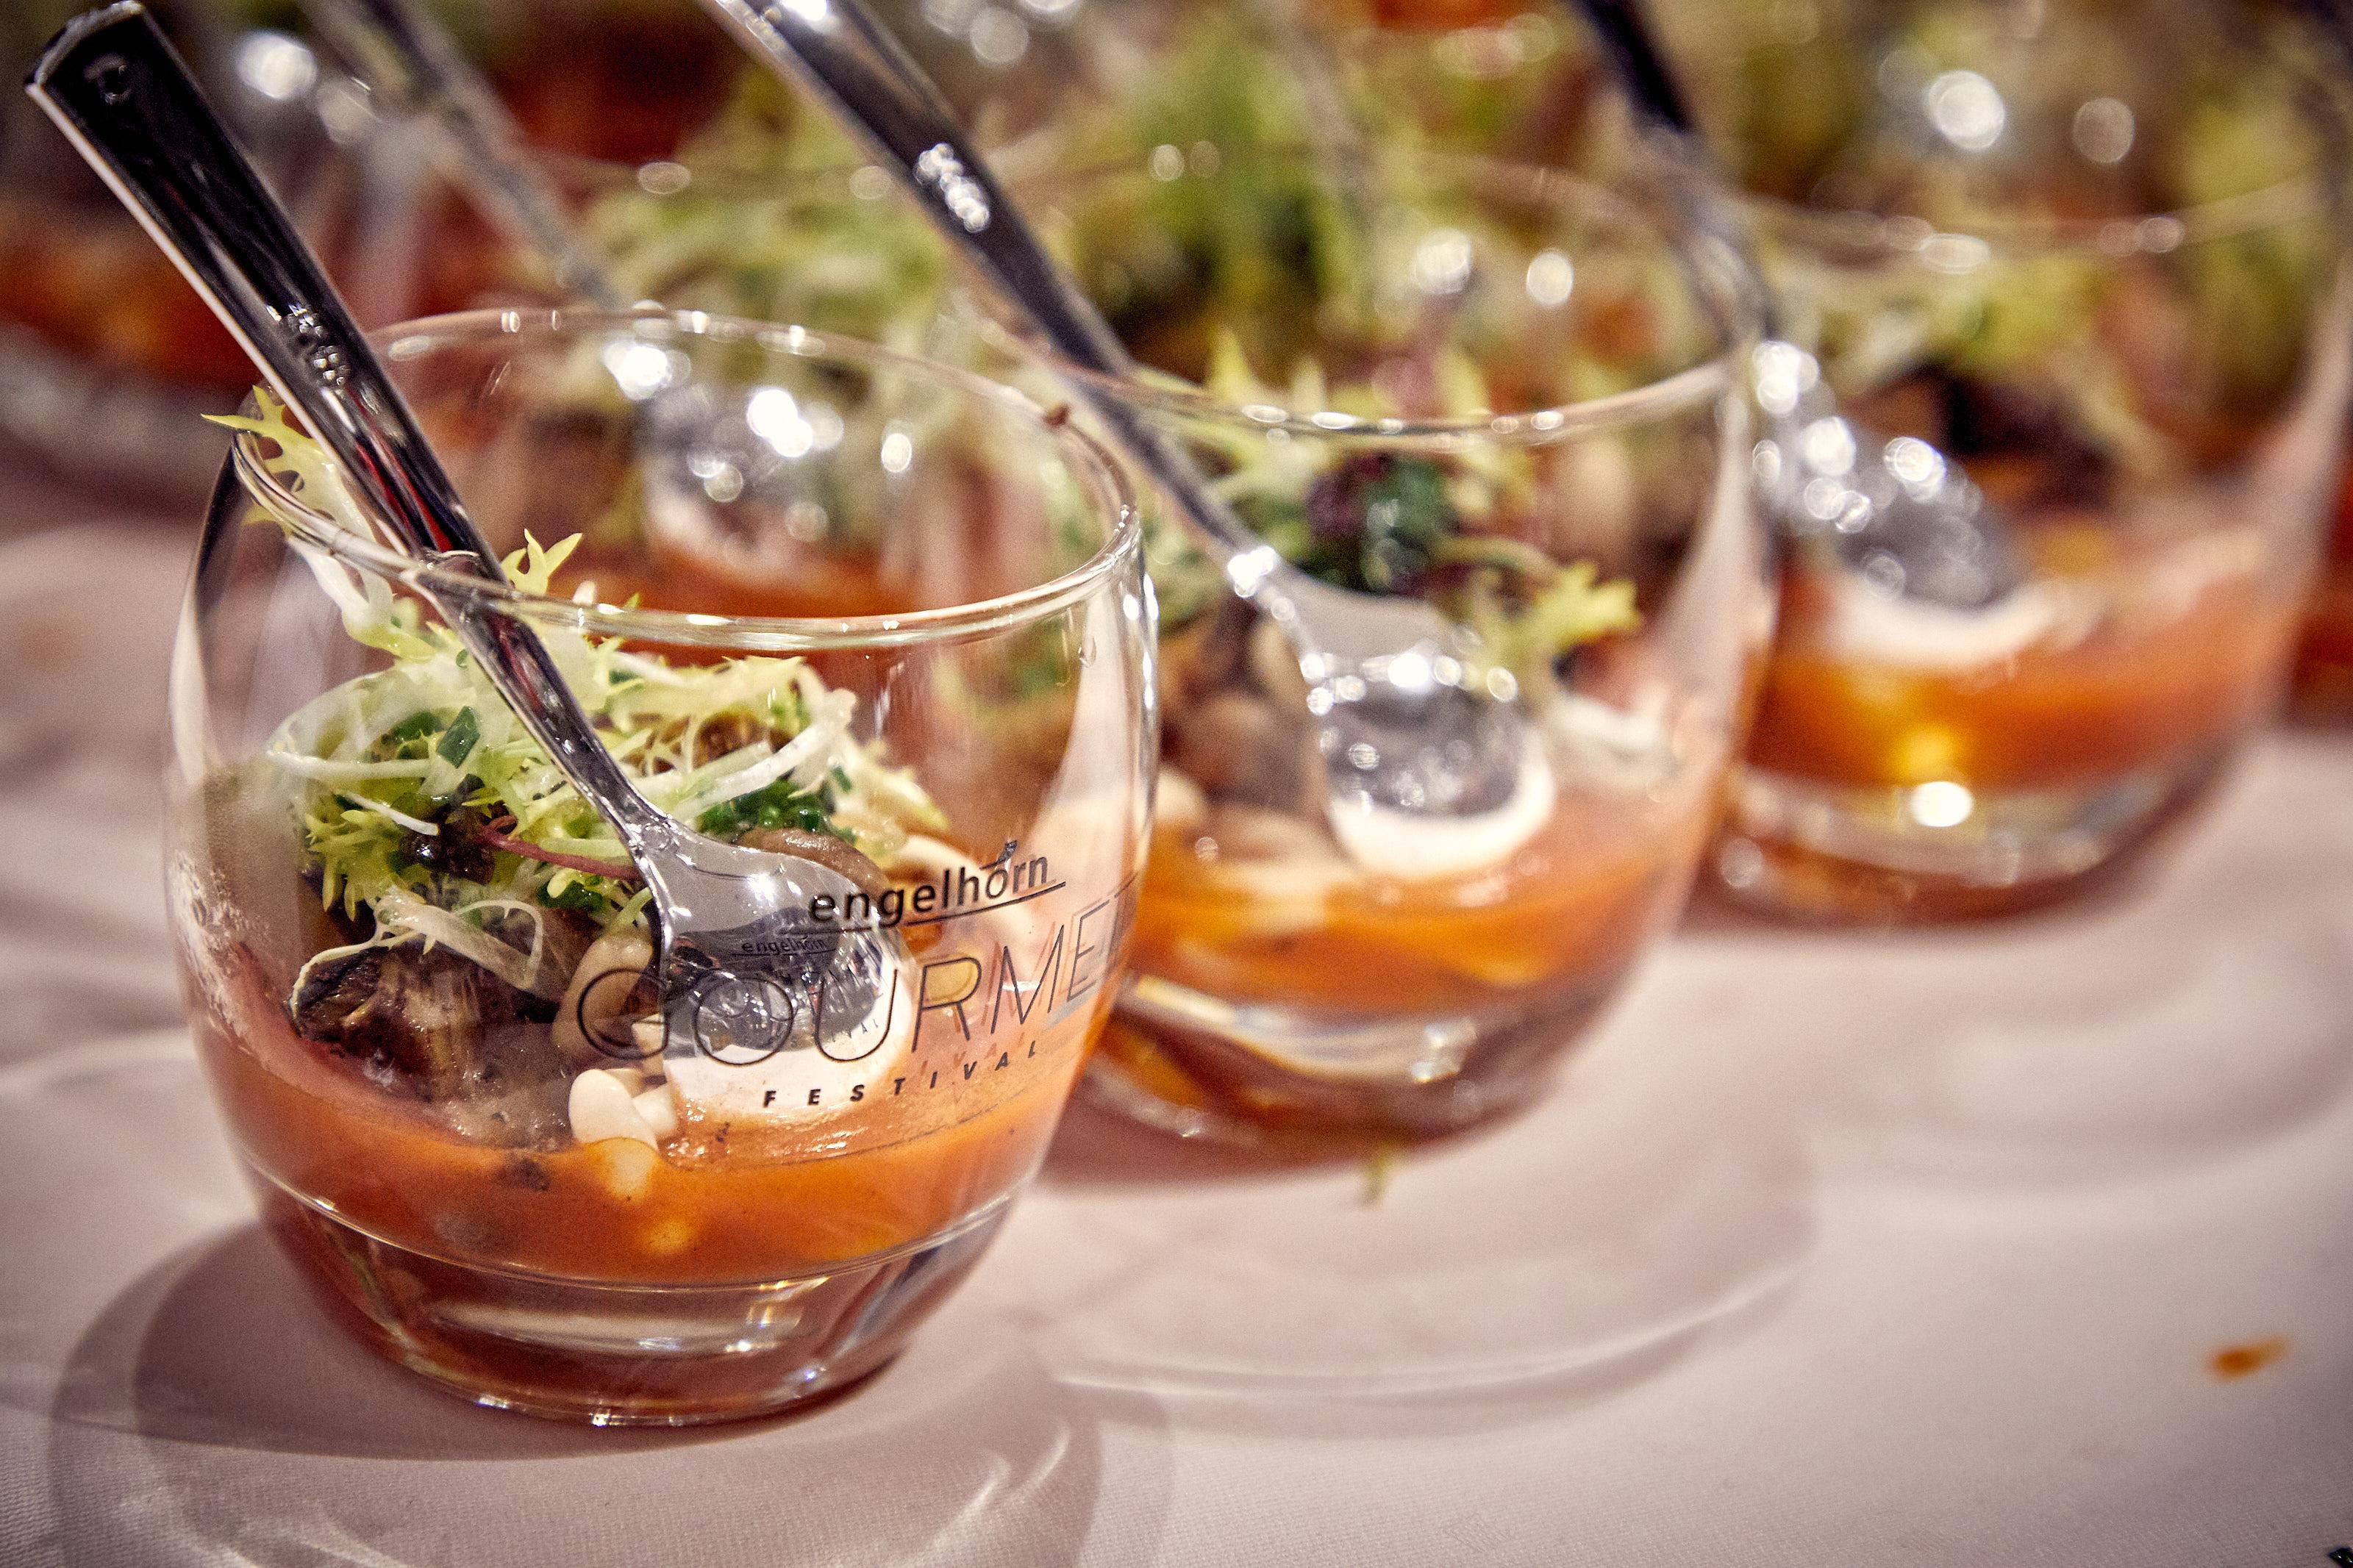 Gourmetfestival Engelhorn